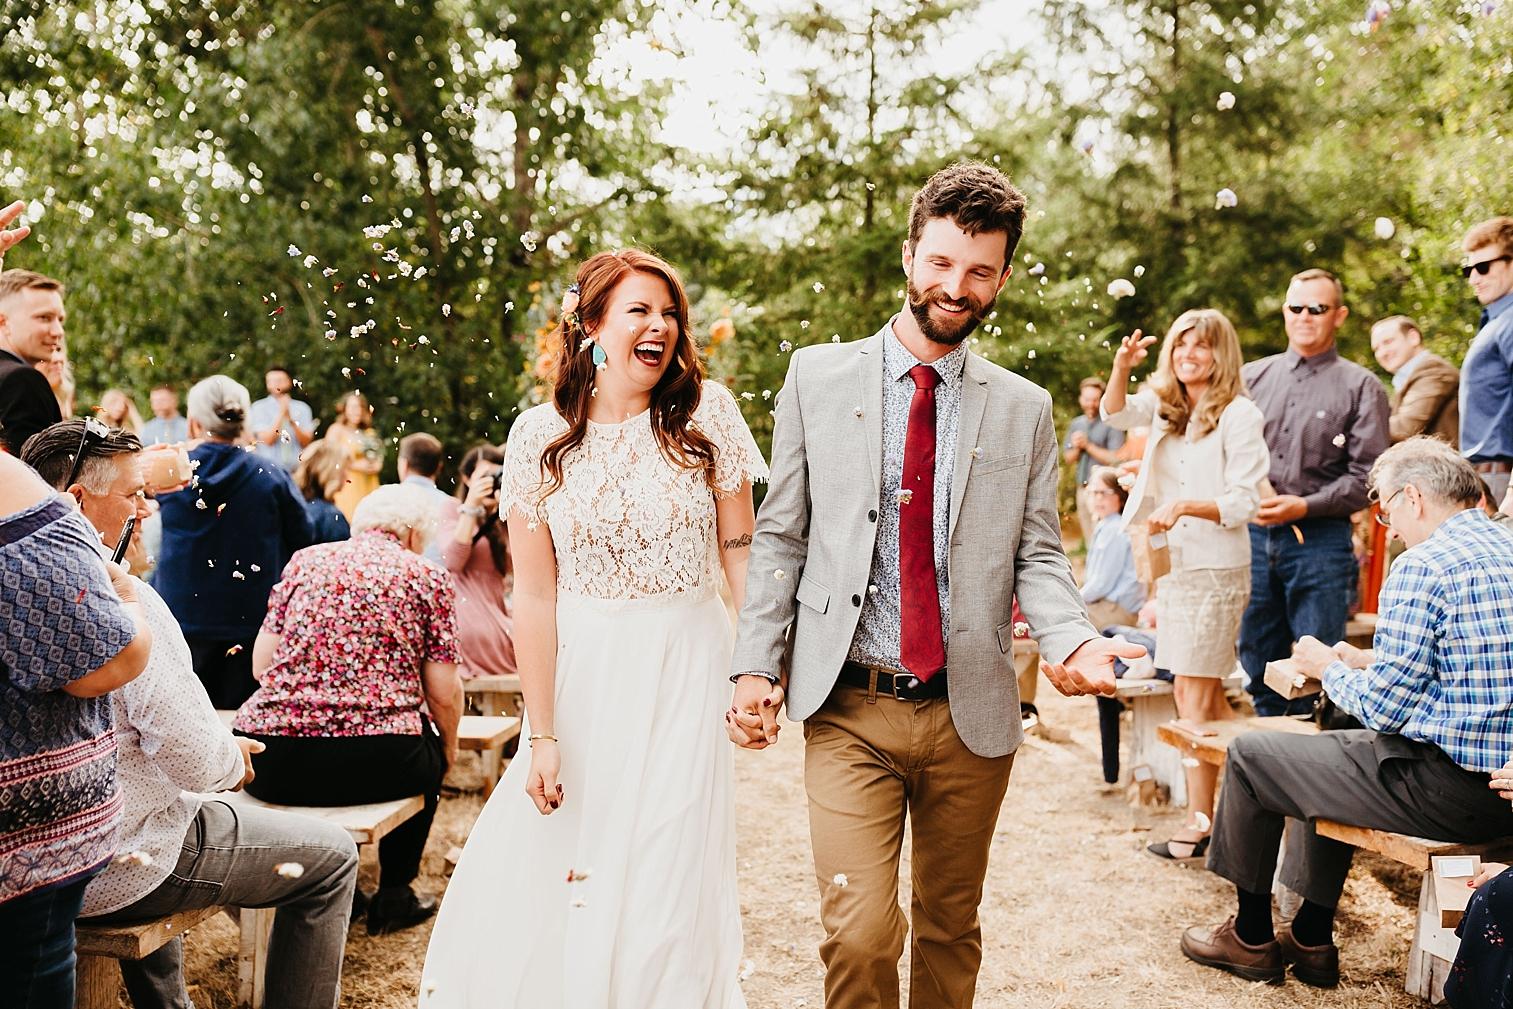 Summer-Camp-Themed-Wedding-105.jpg